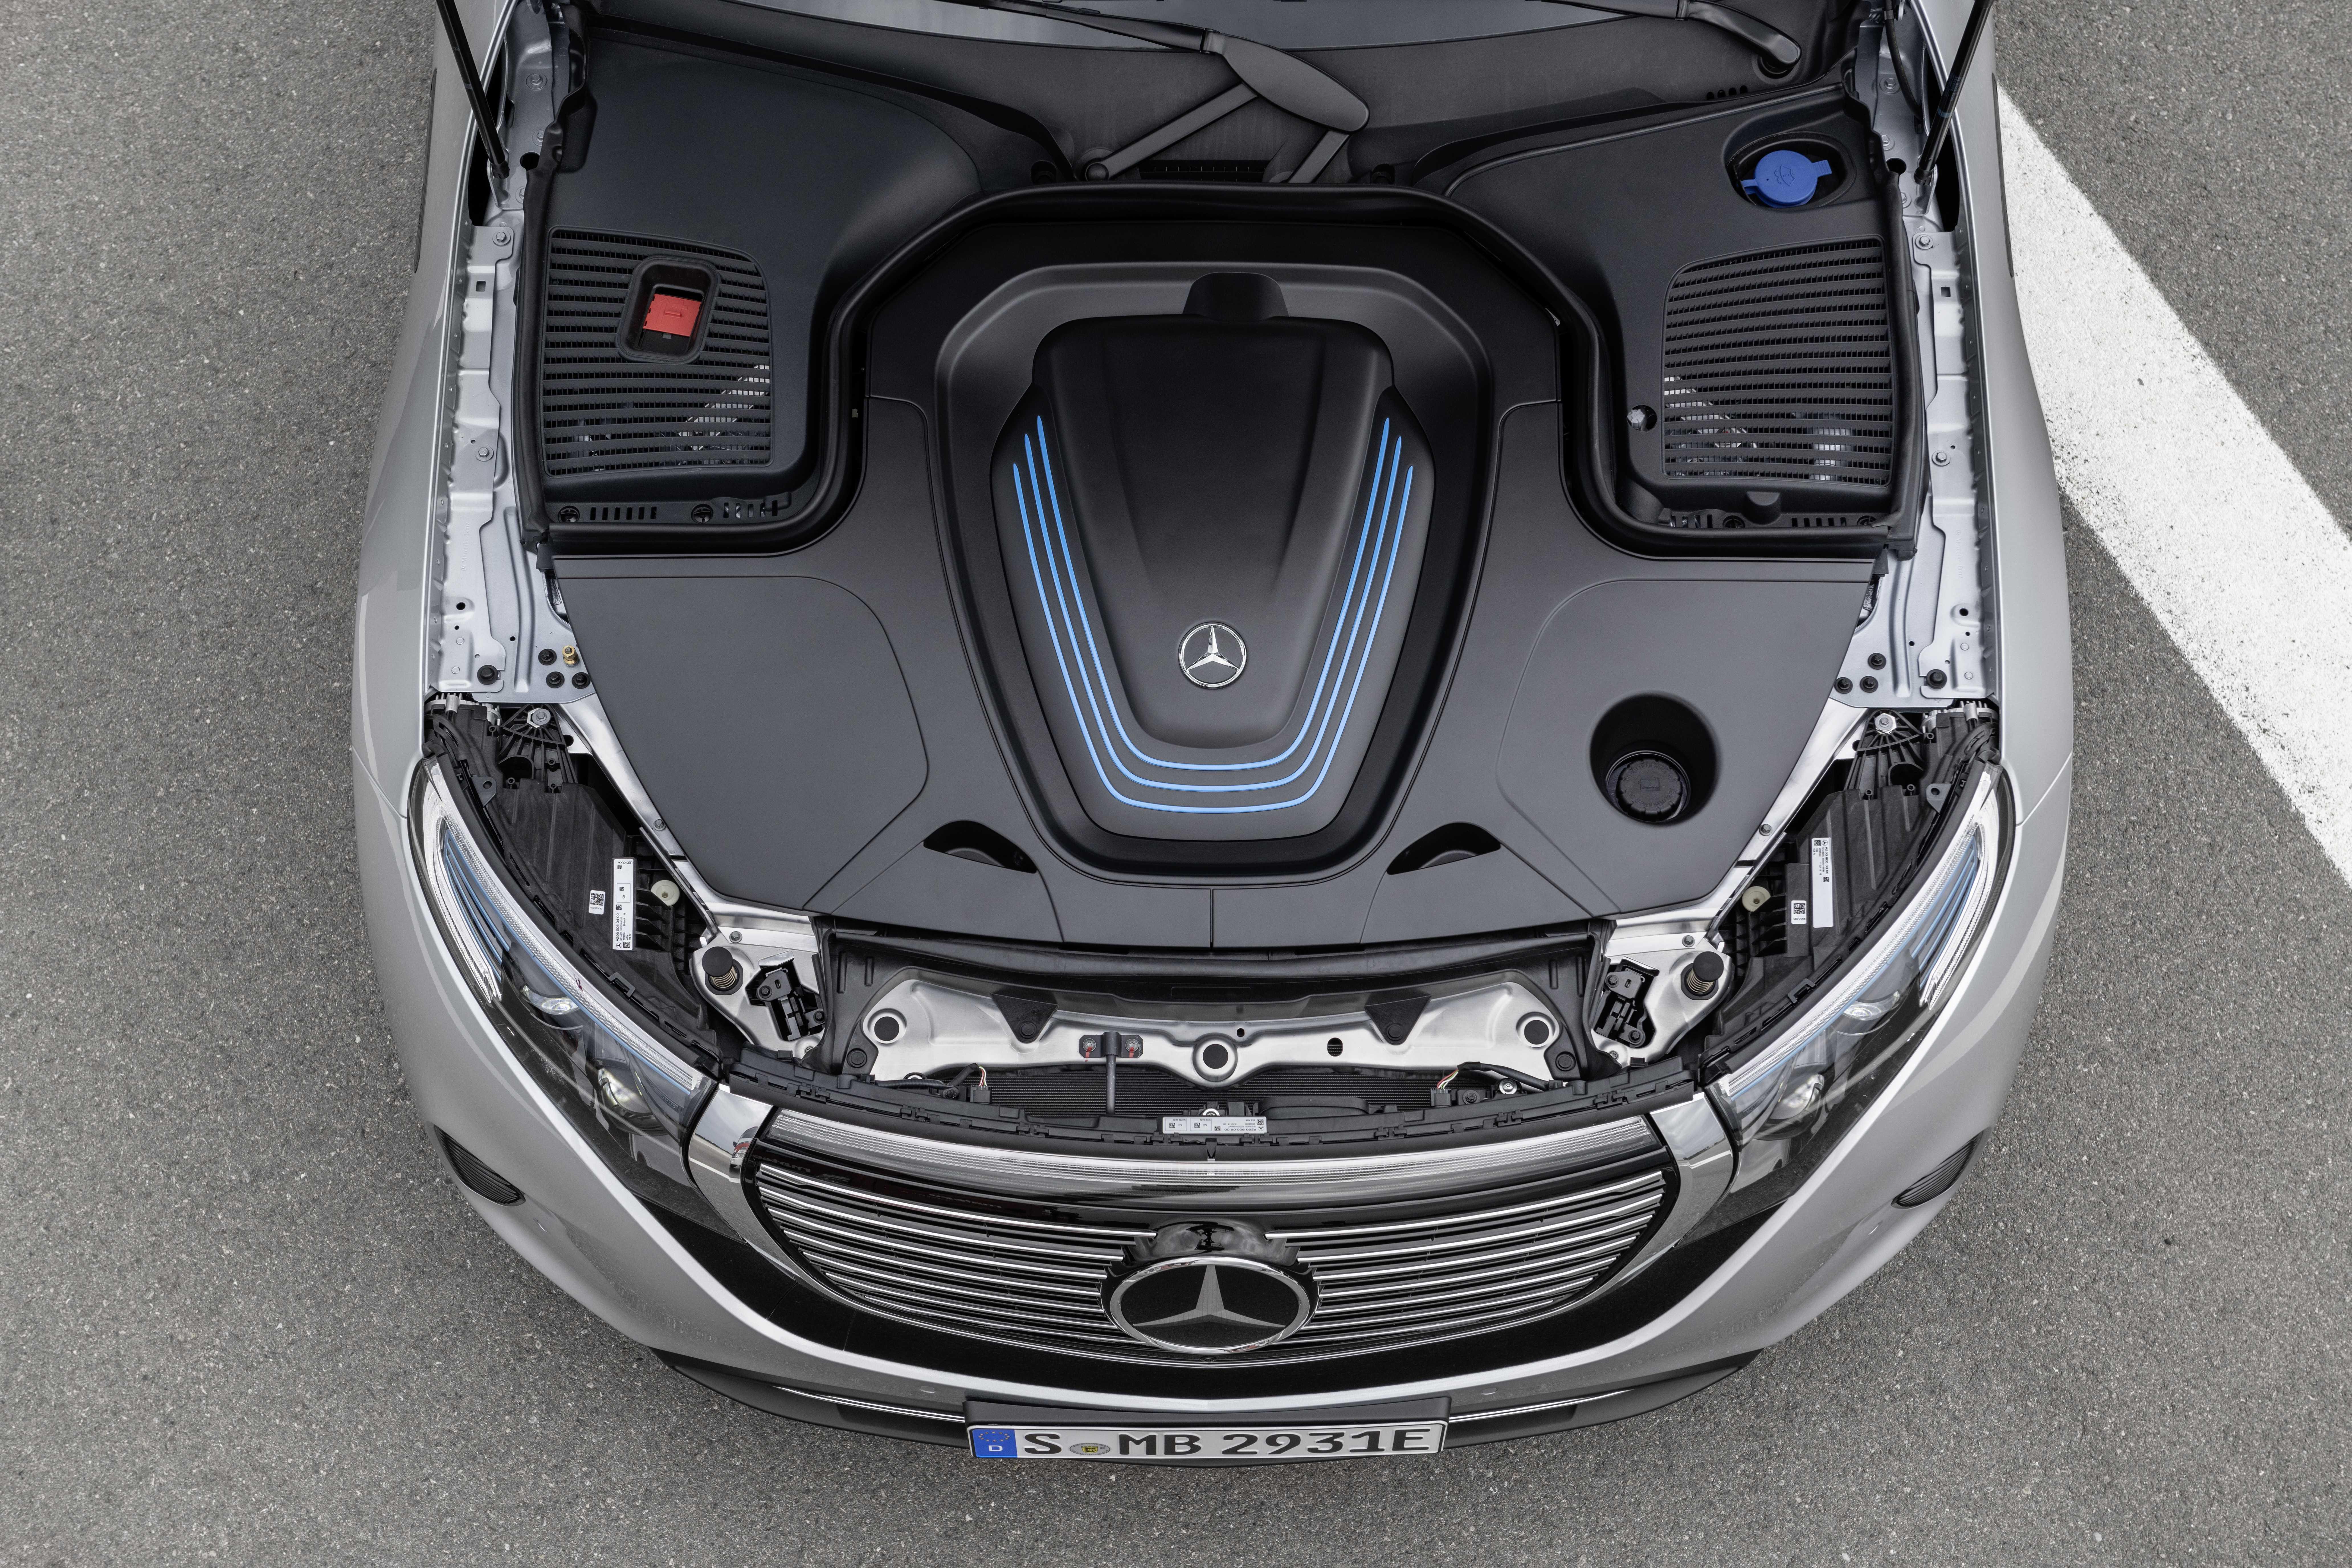 Mercedes-Benz EQC 400 Single Speed, 408hp, 2019